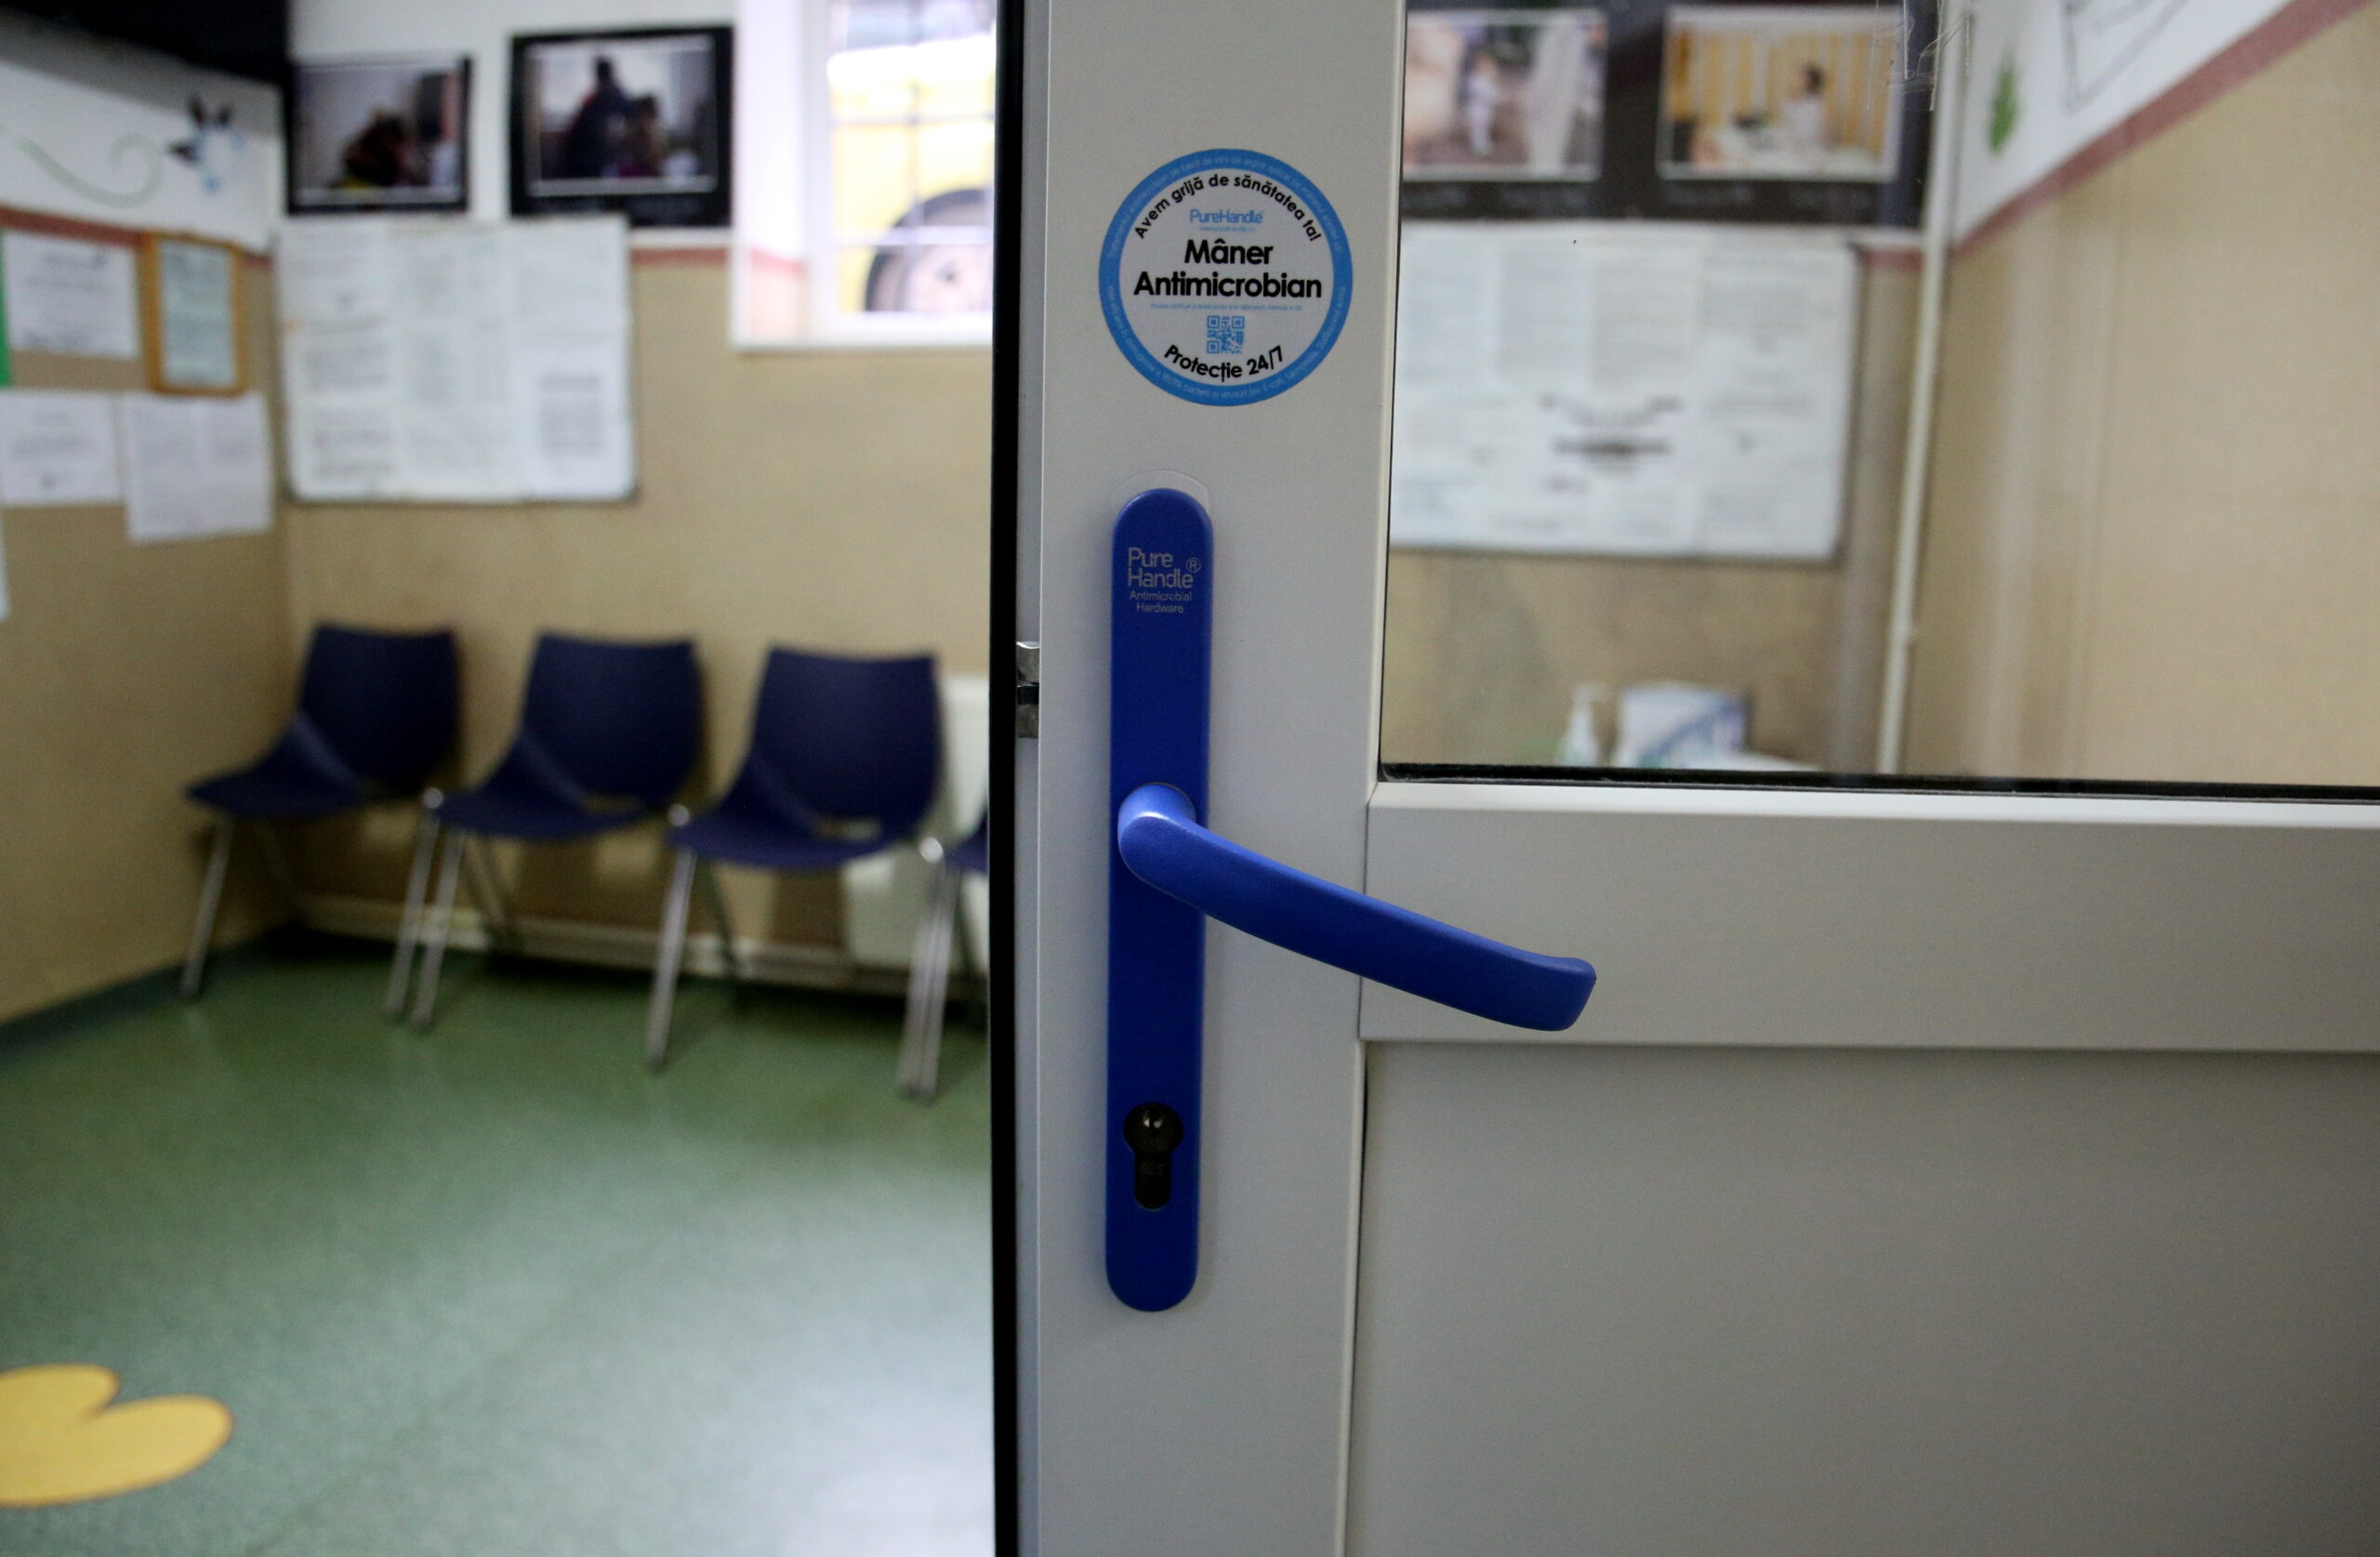 Termo Express a donat spitalelor din prima linie mânere antimicrobiene